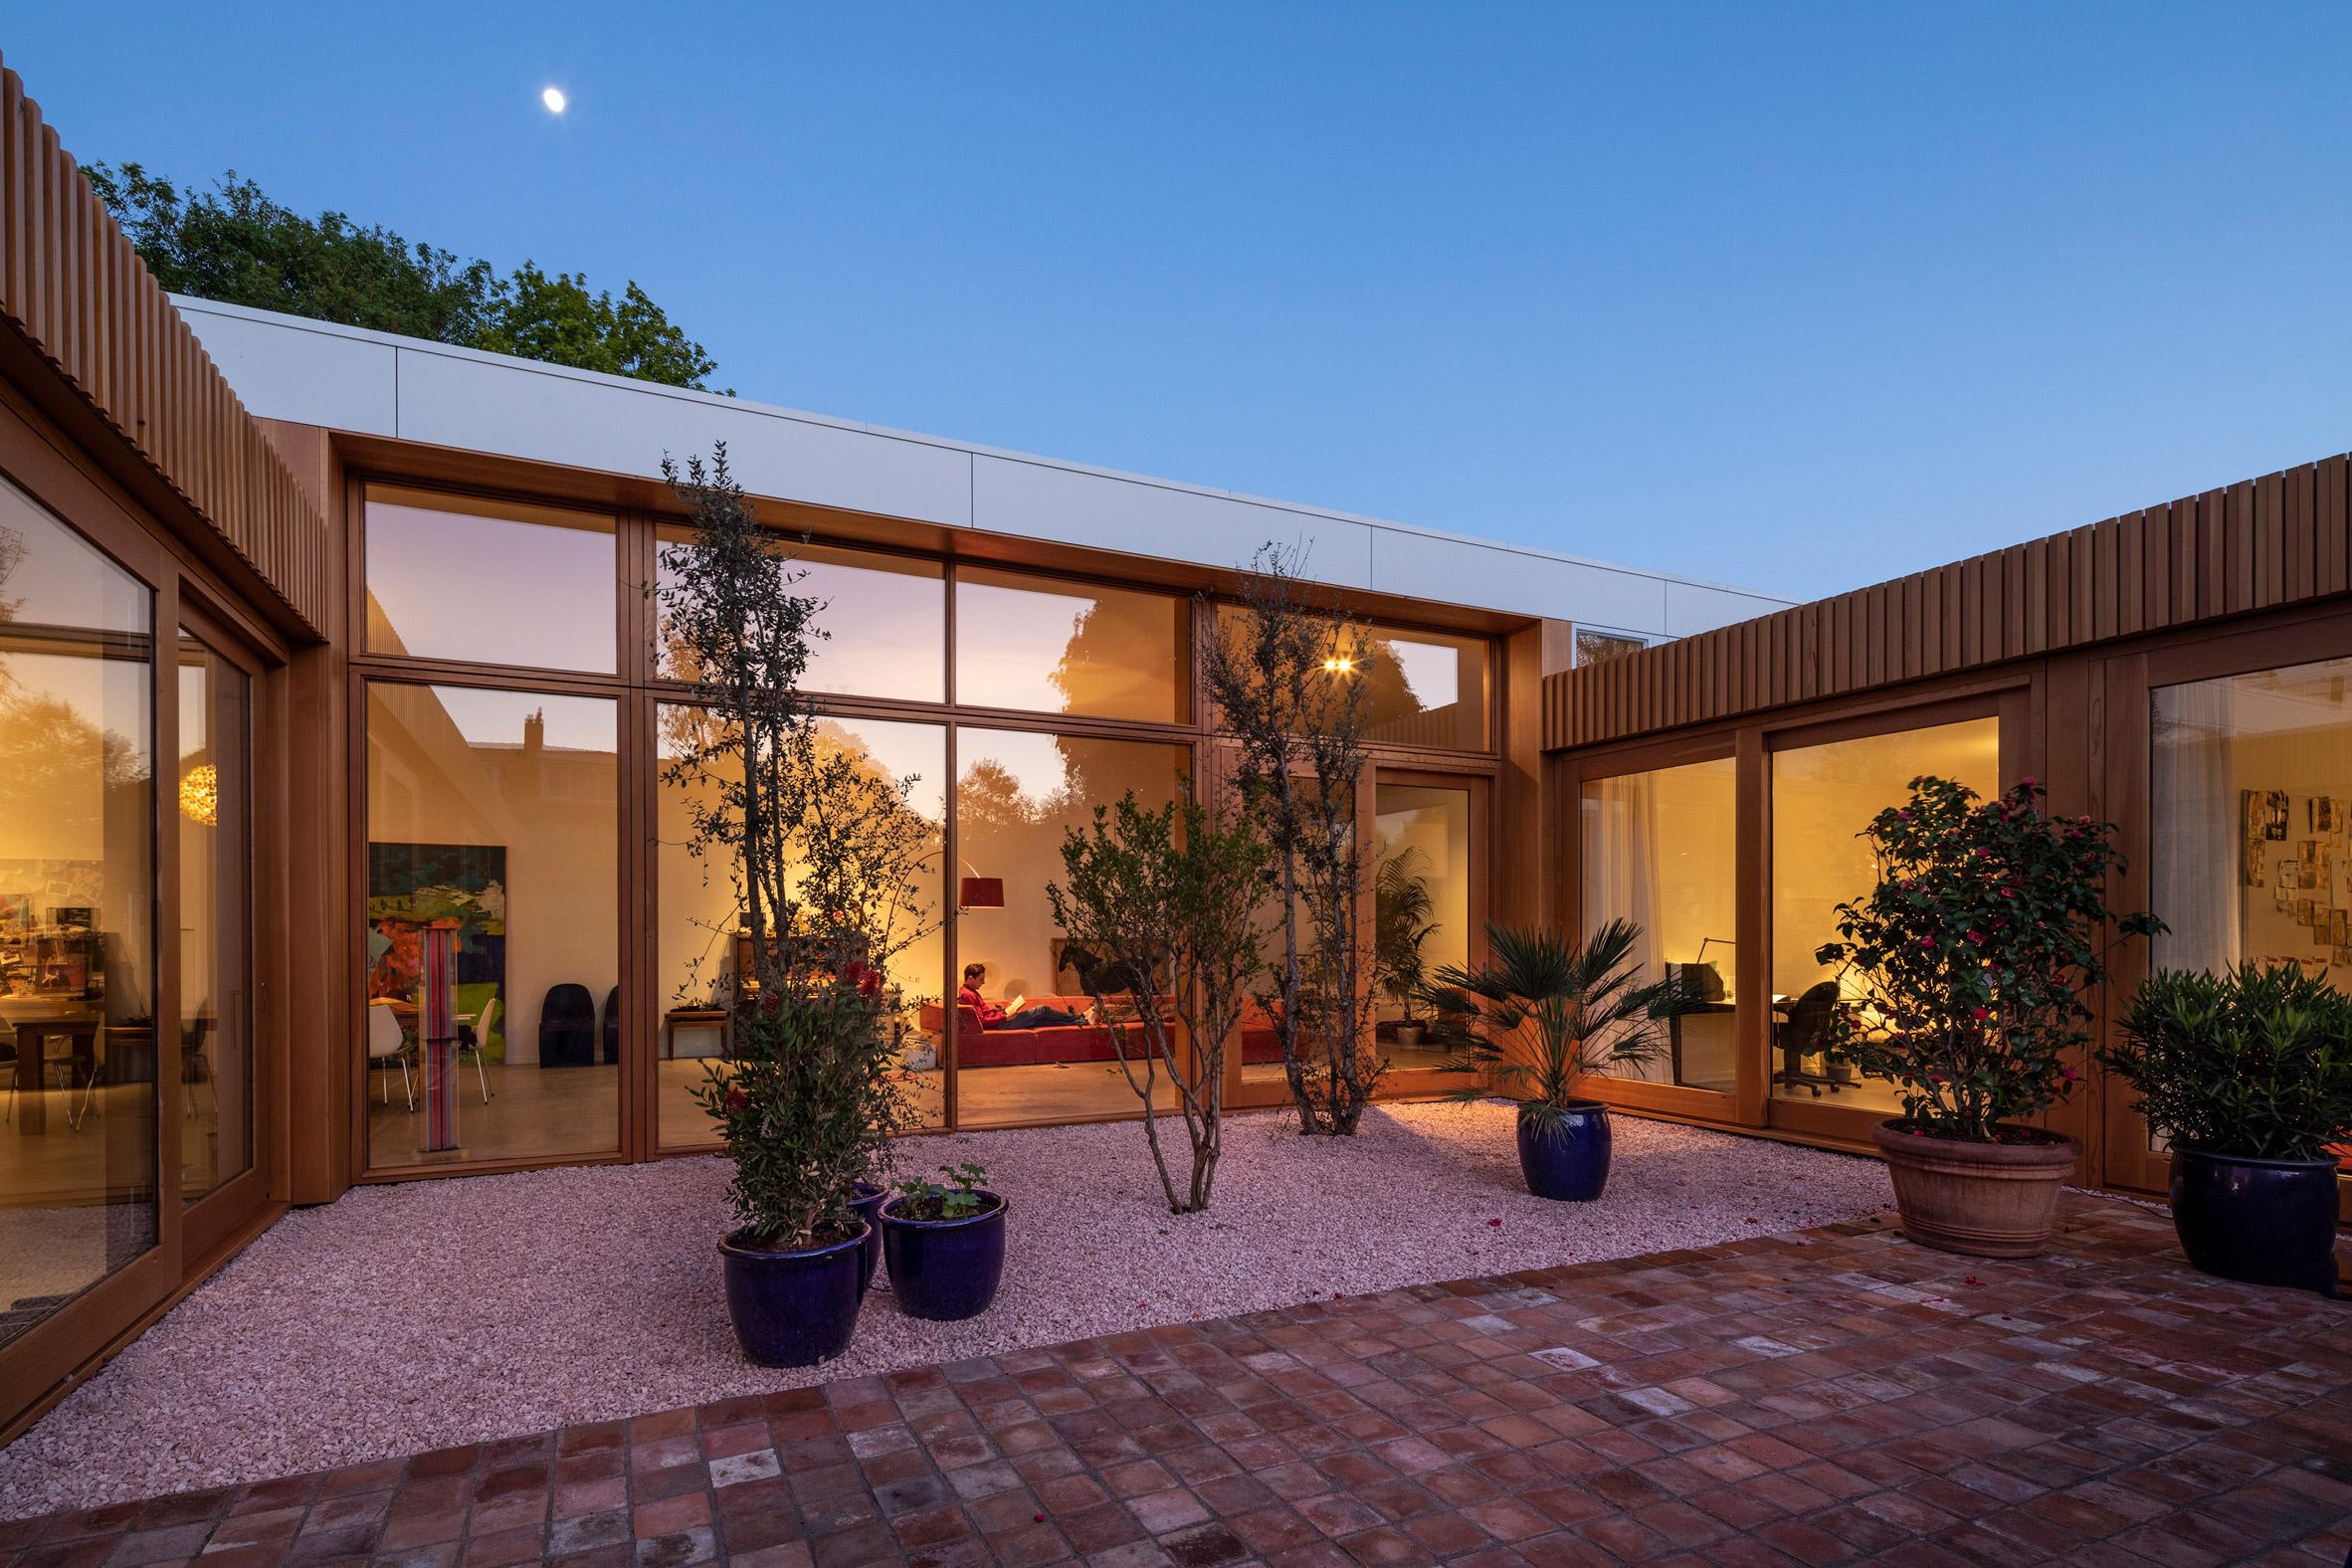 Villa Stardust by MVRDV